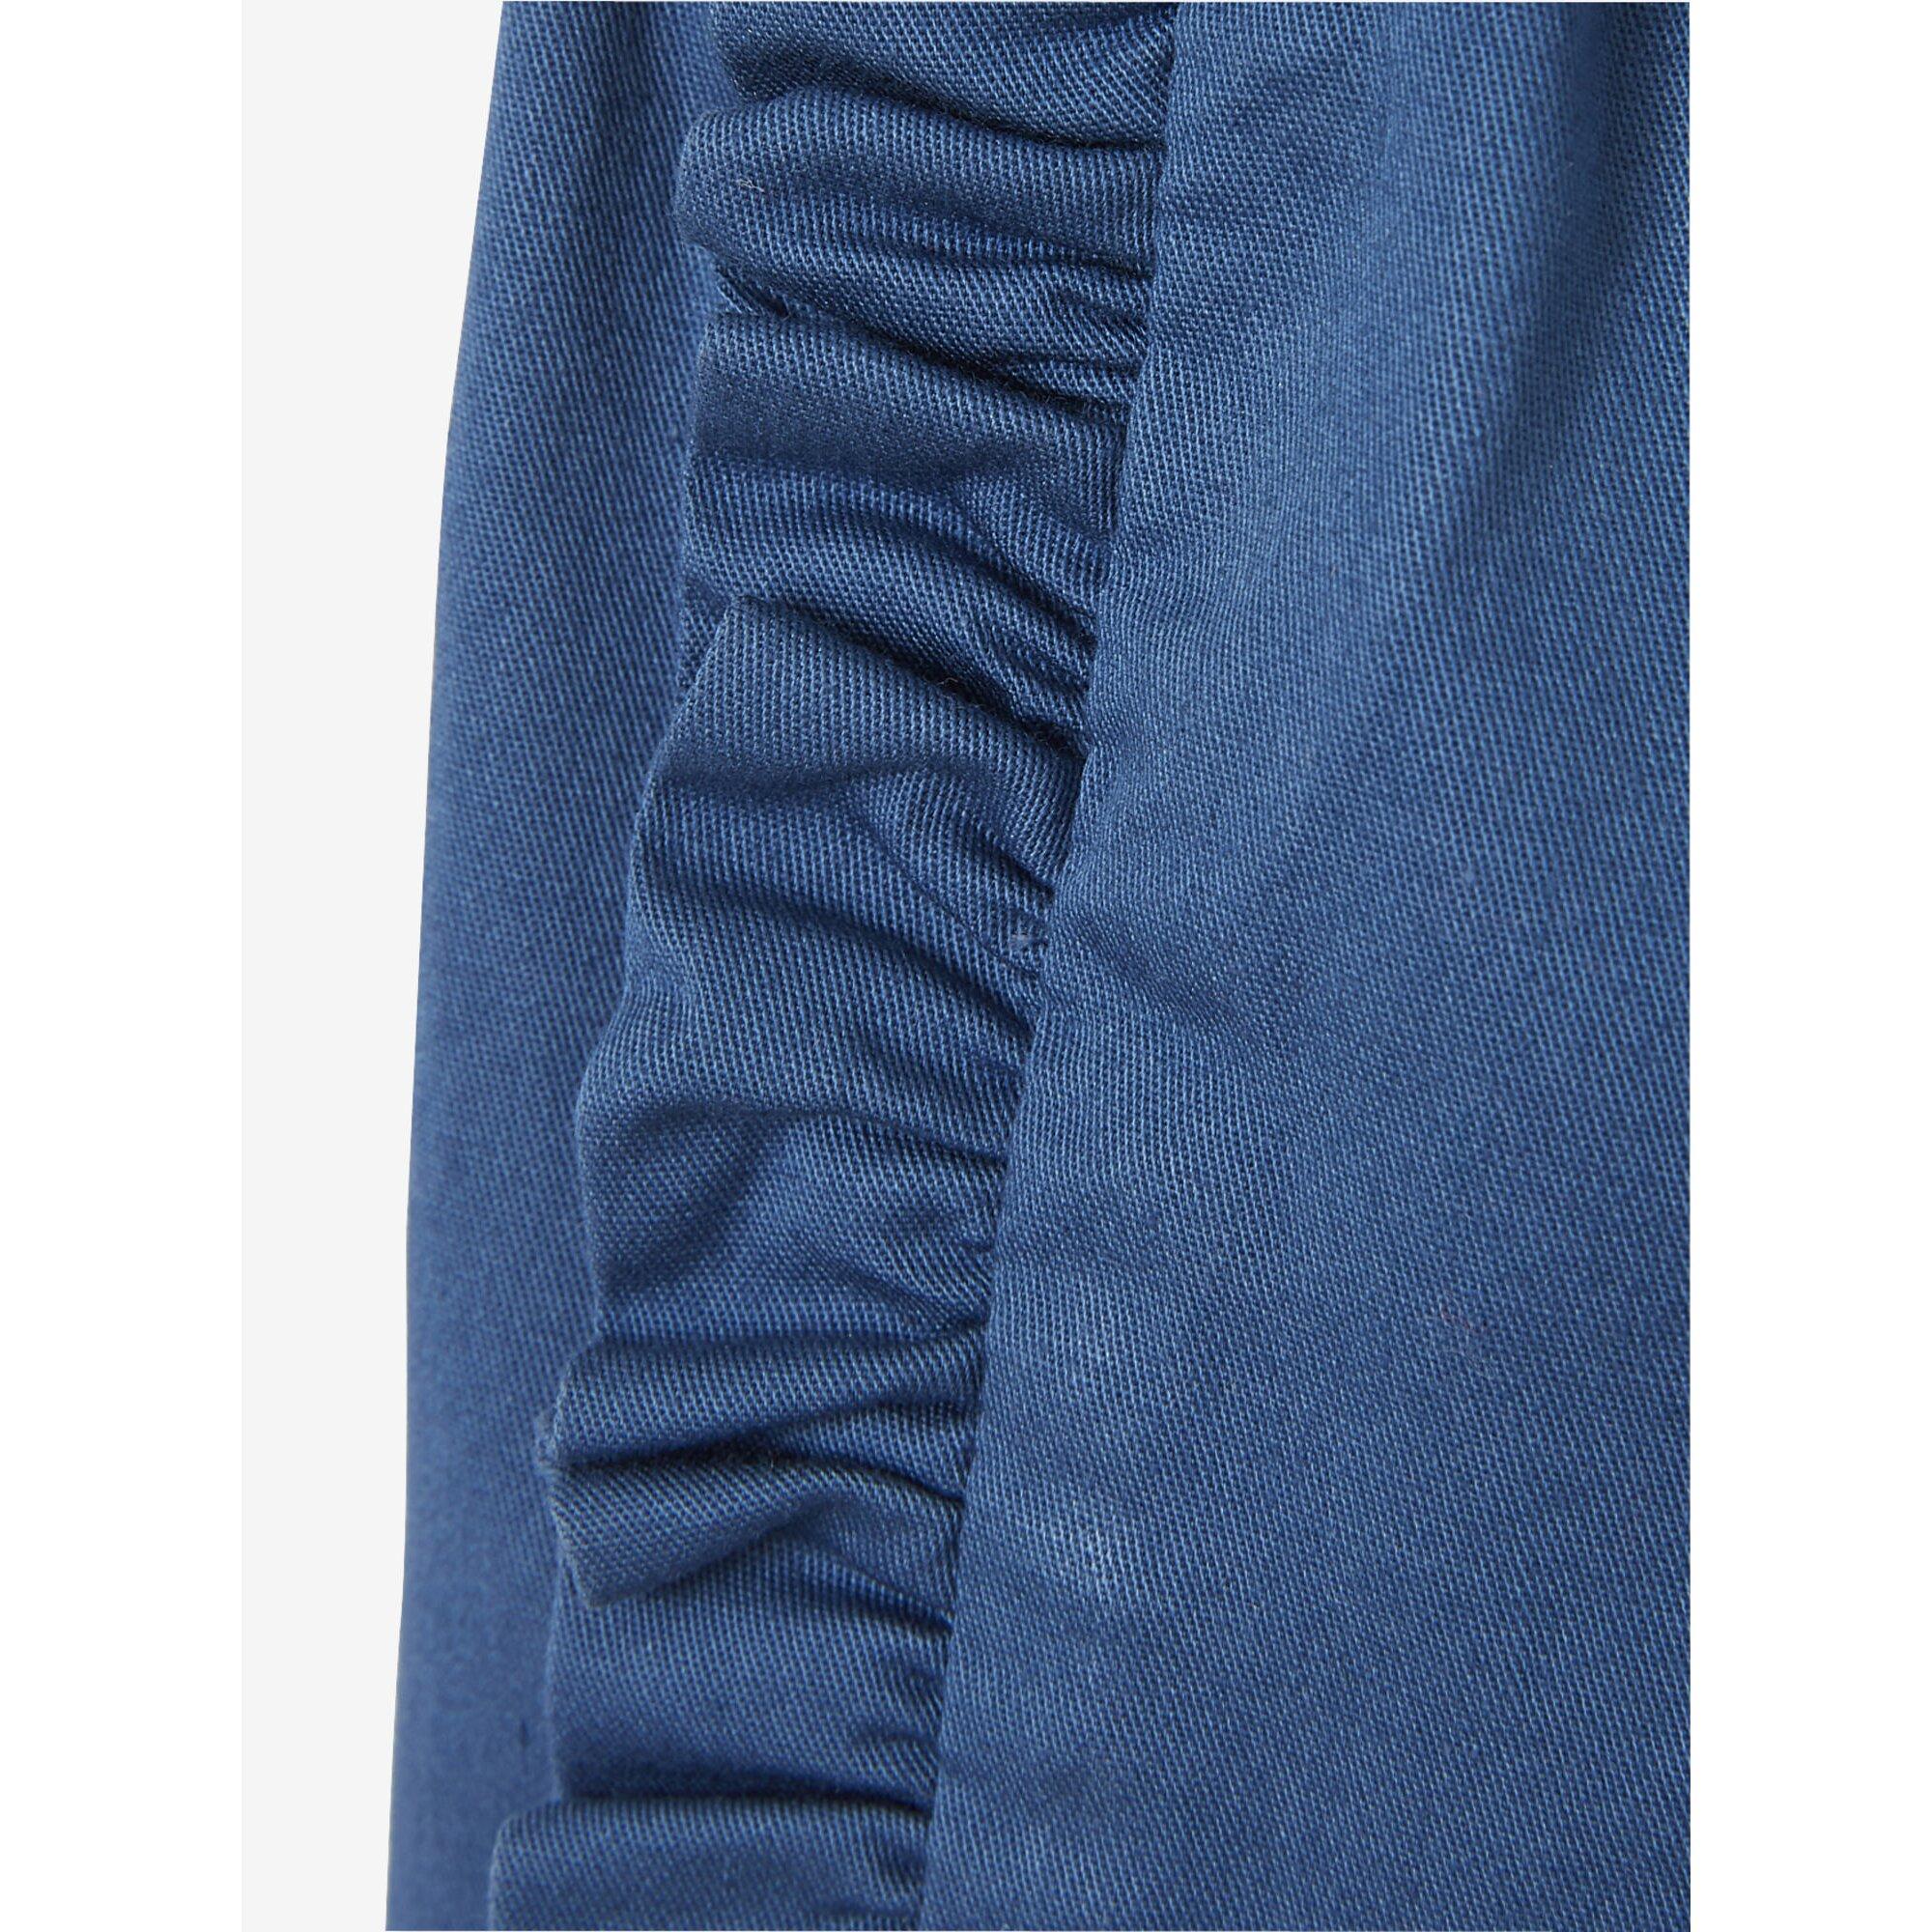 vertbaudet-baby-madchen-shorts-mit-volants